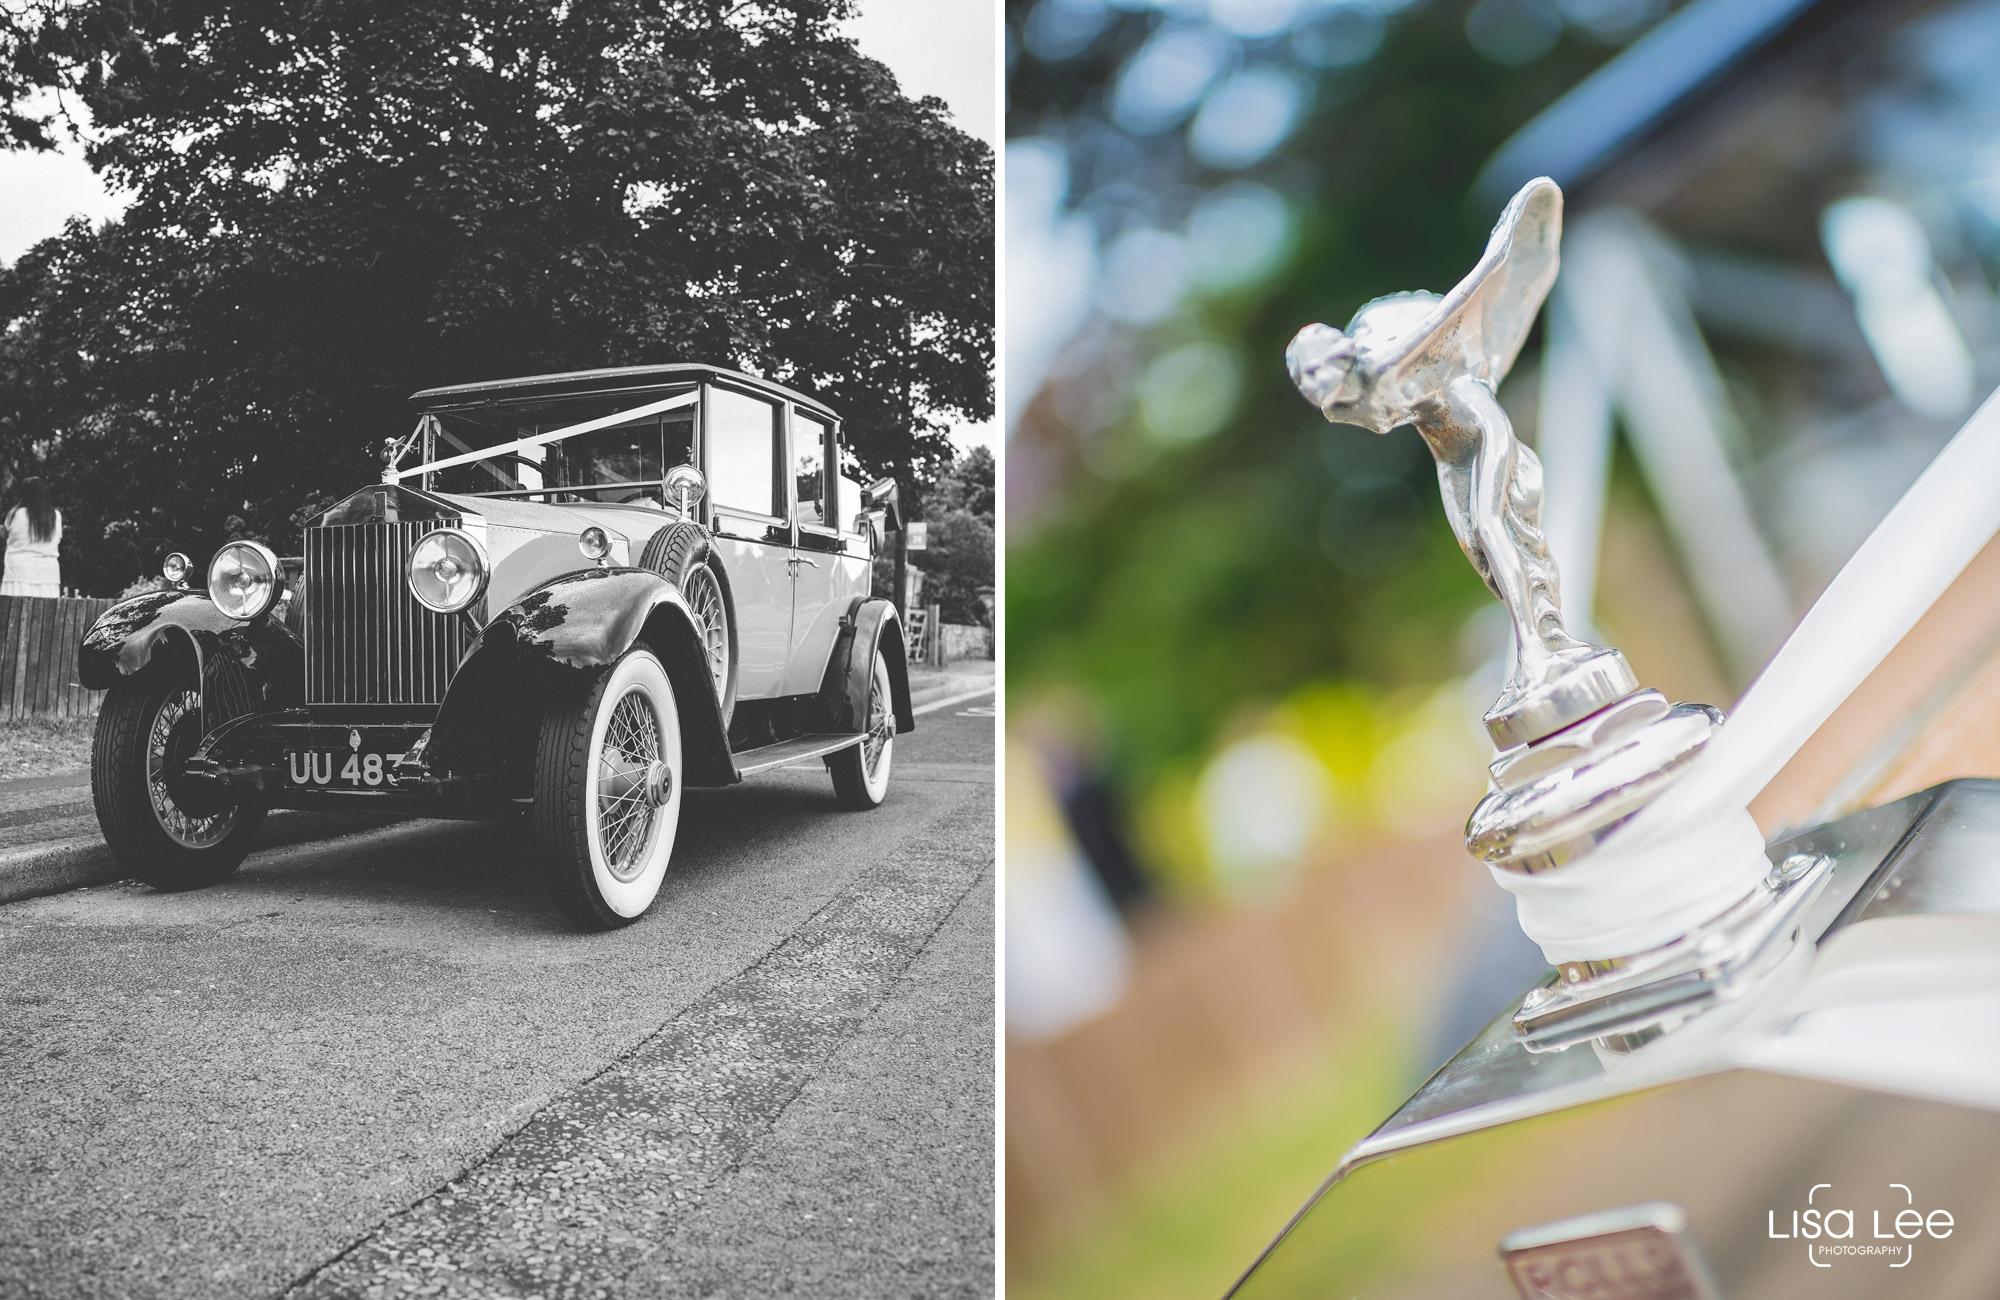 lisa-lee-wedding-photography-burton-wedding-car.jpg